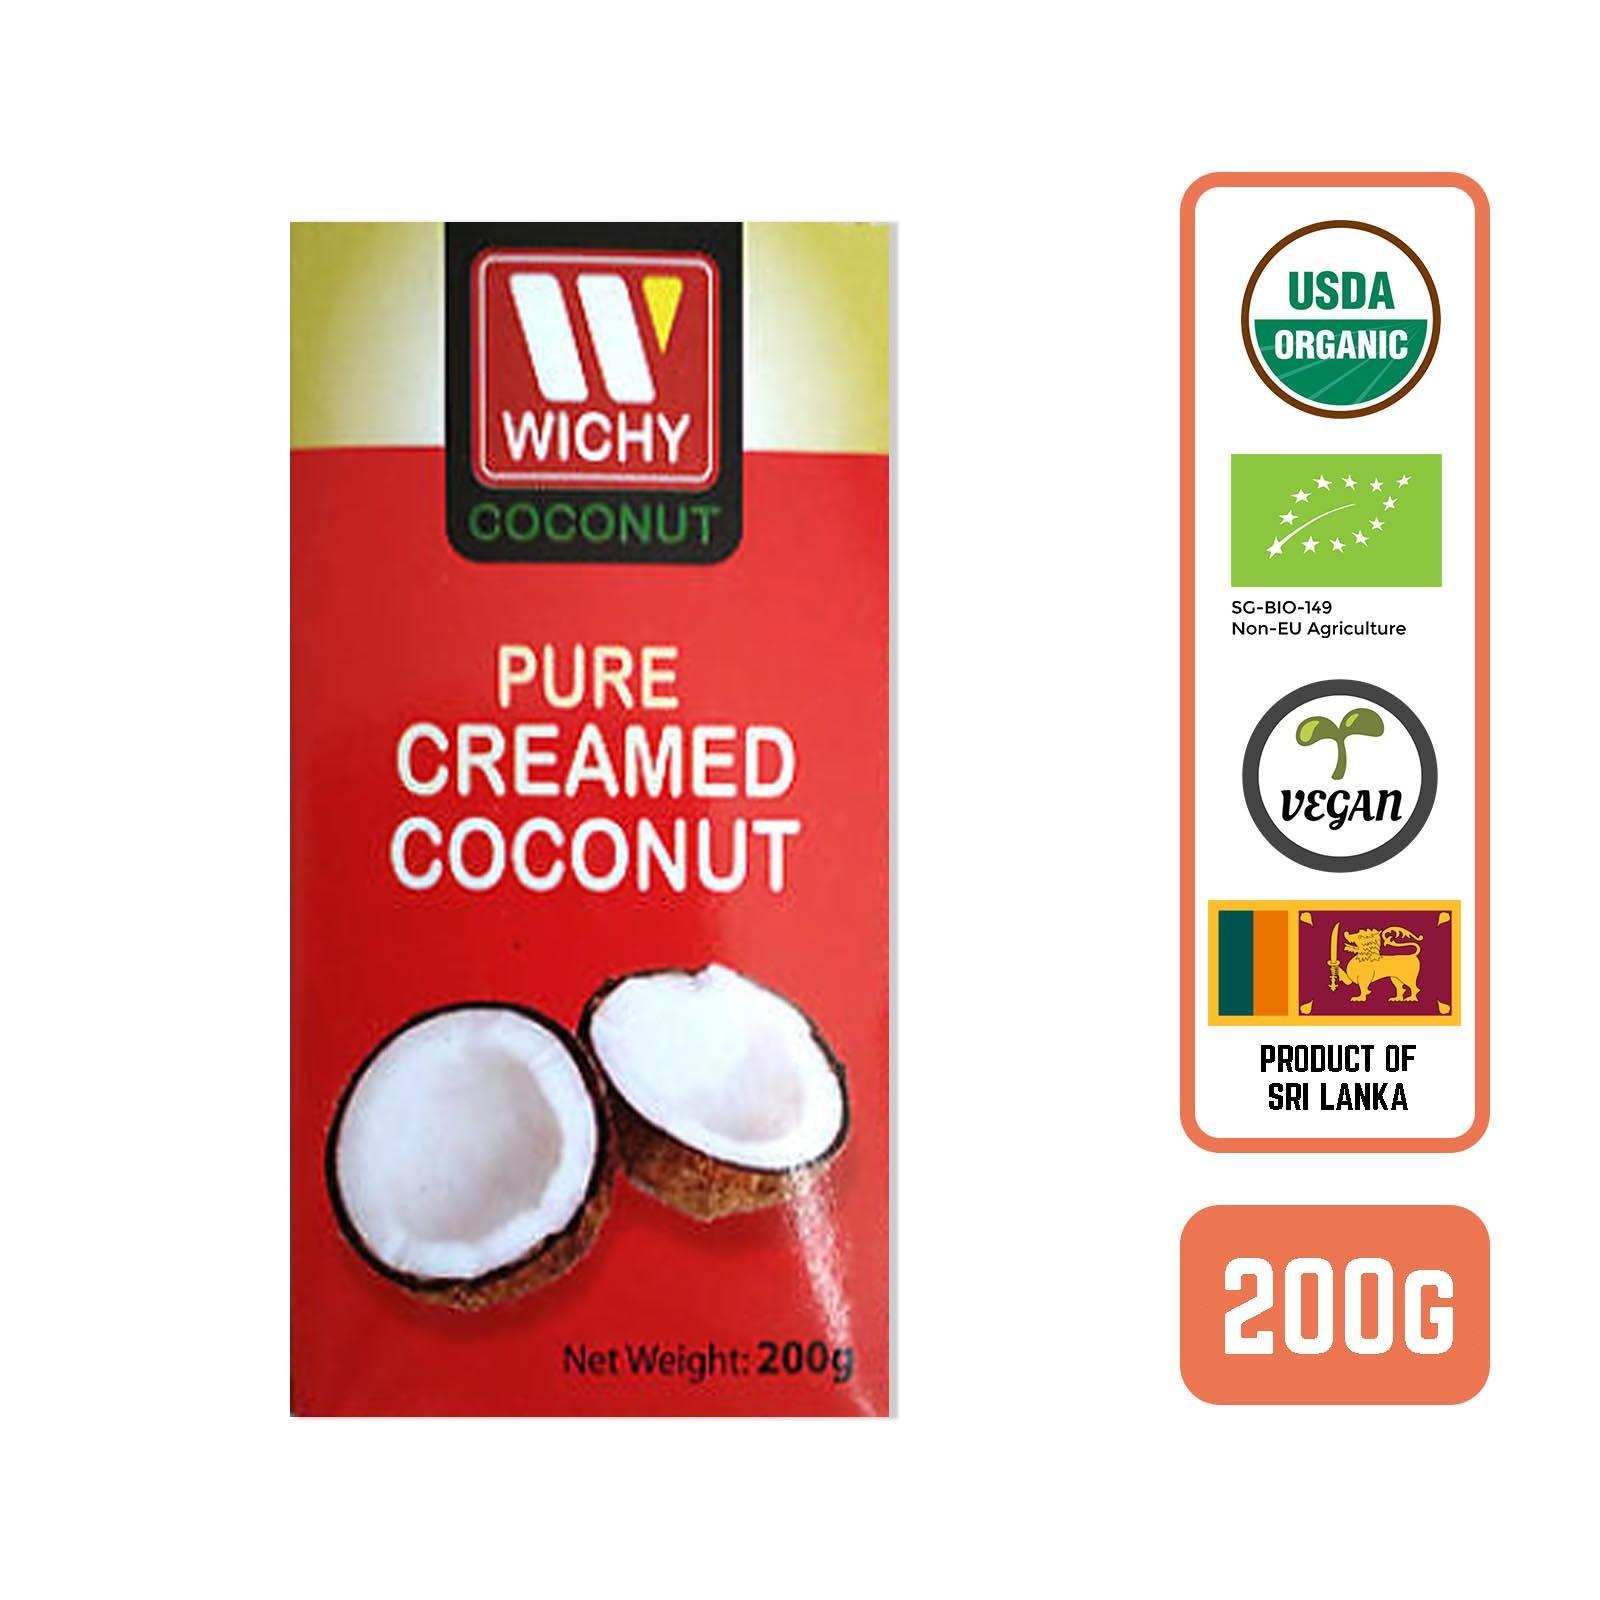 WICHY Organic Coconut Cream - by Foodsterr